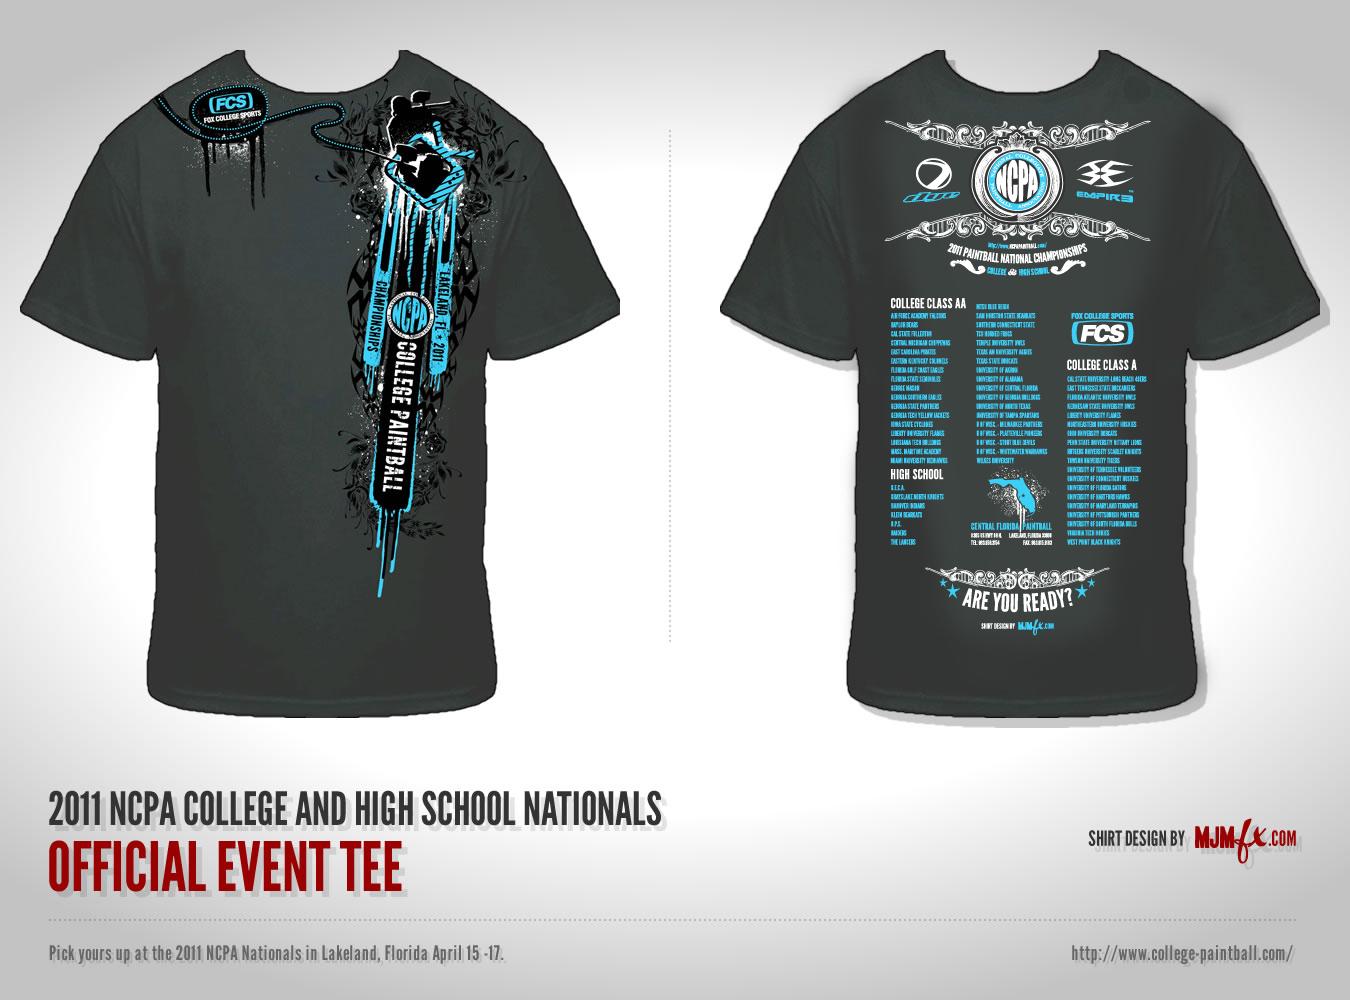 2011 National Championships T-Shirt